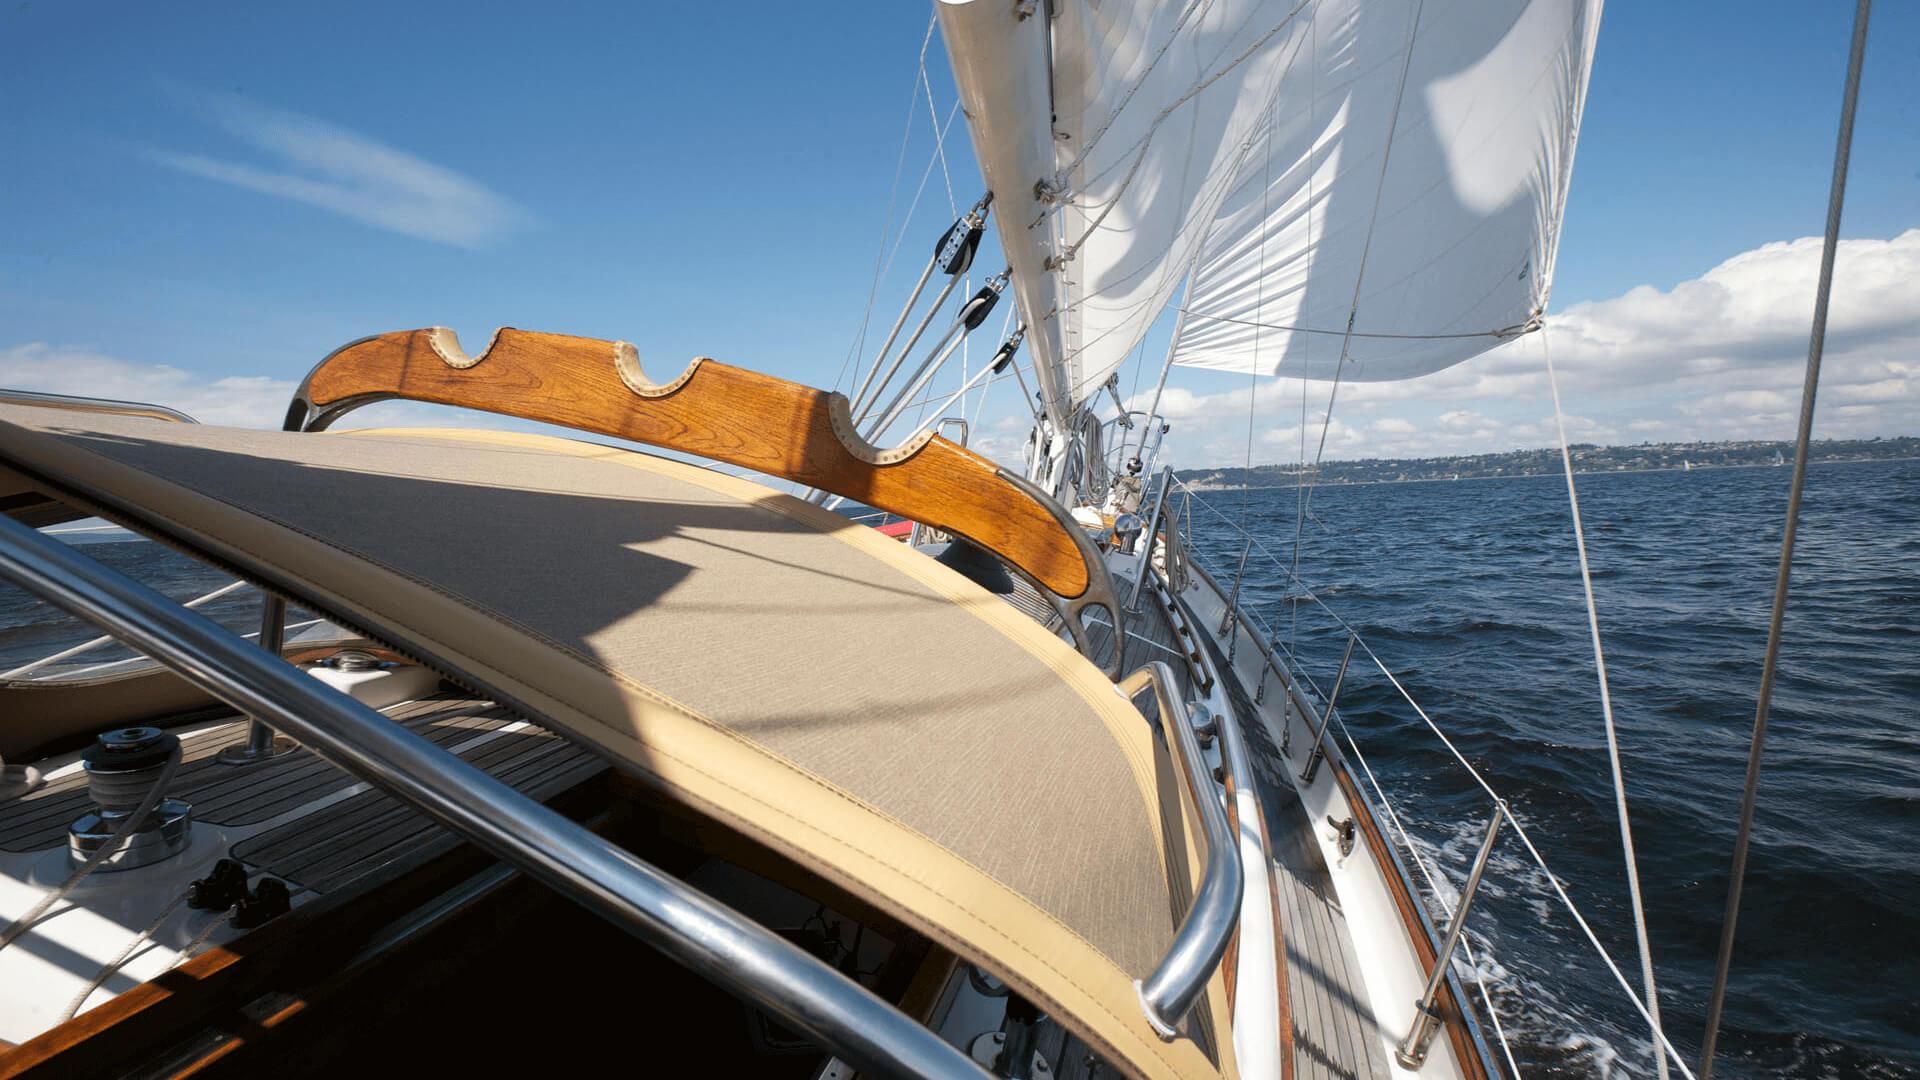 Bimini feito com tecidos Sunbrella no veleiro Galatea